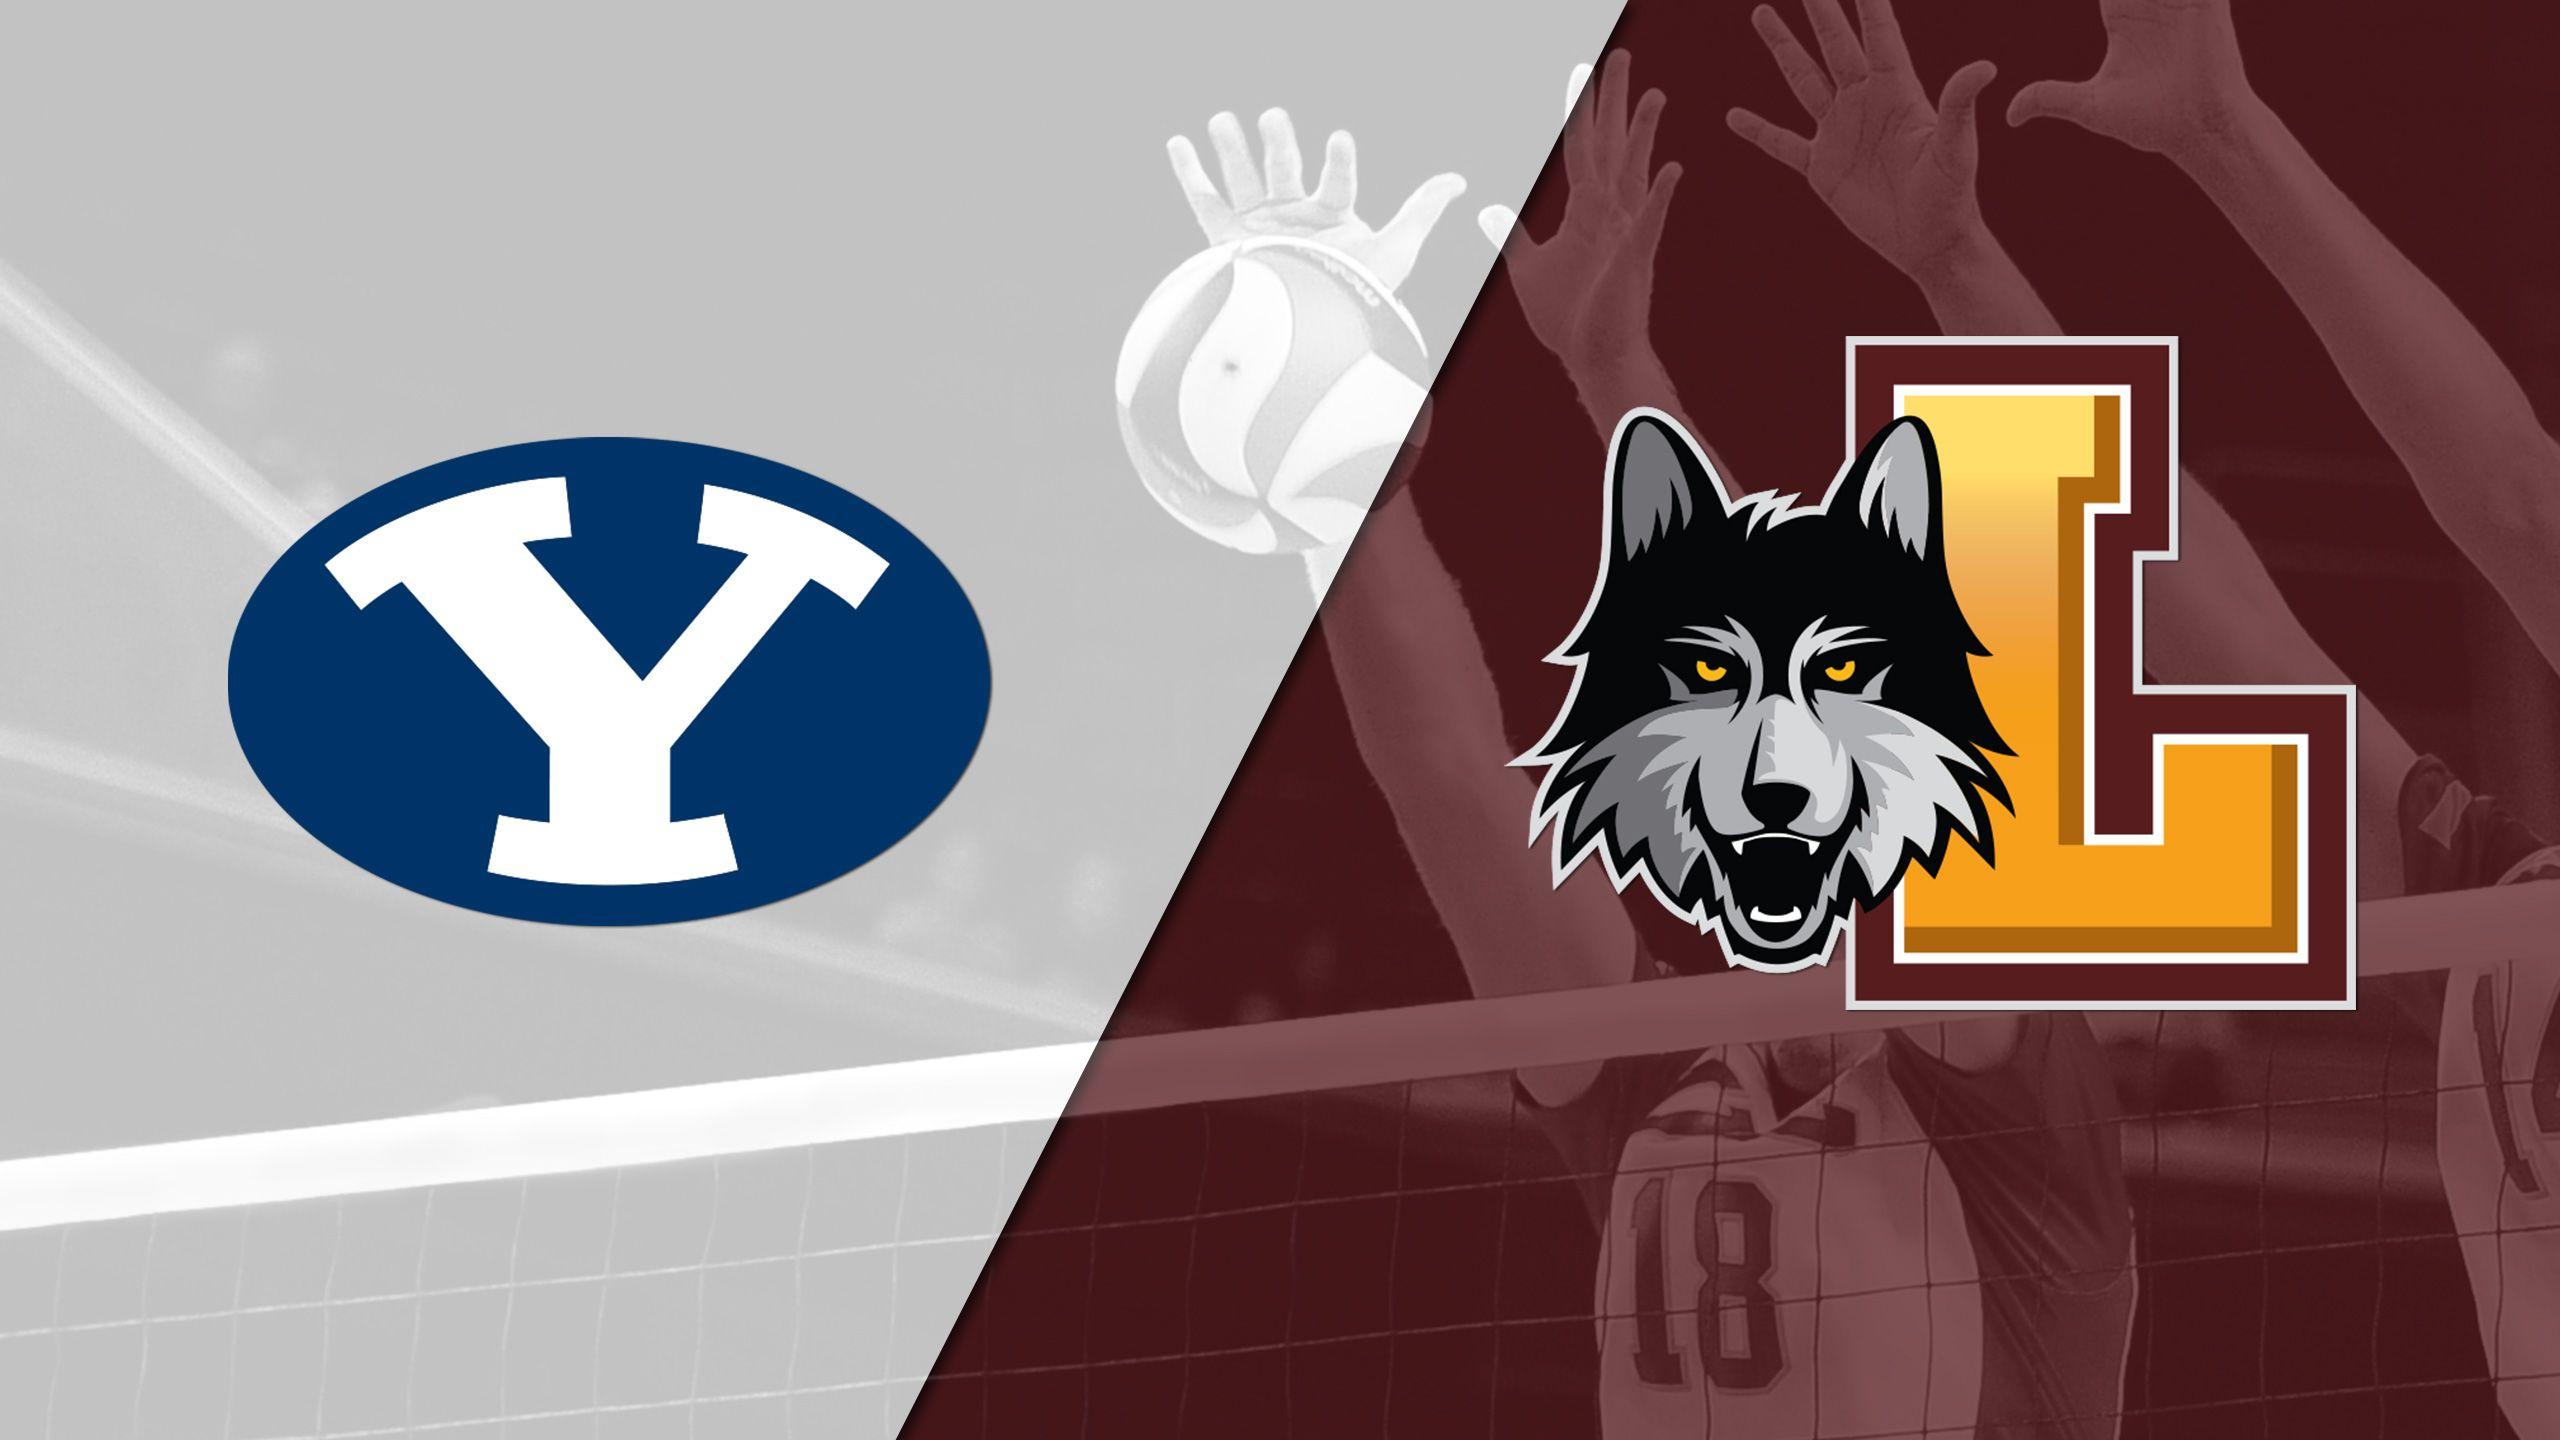 BYU vs. Loyola-Chicago (M Volleyball)